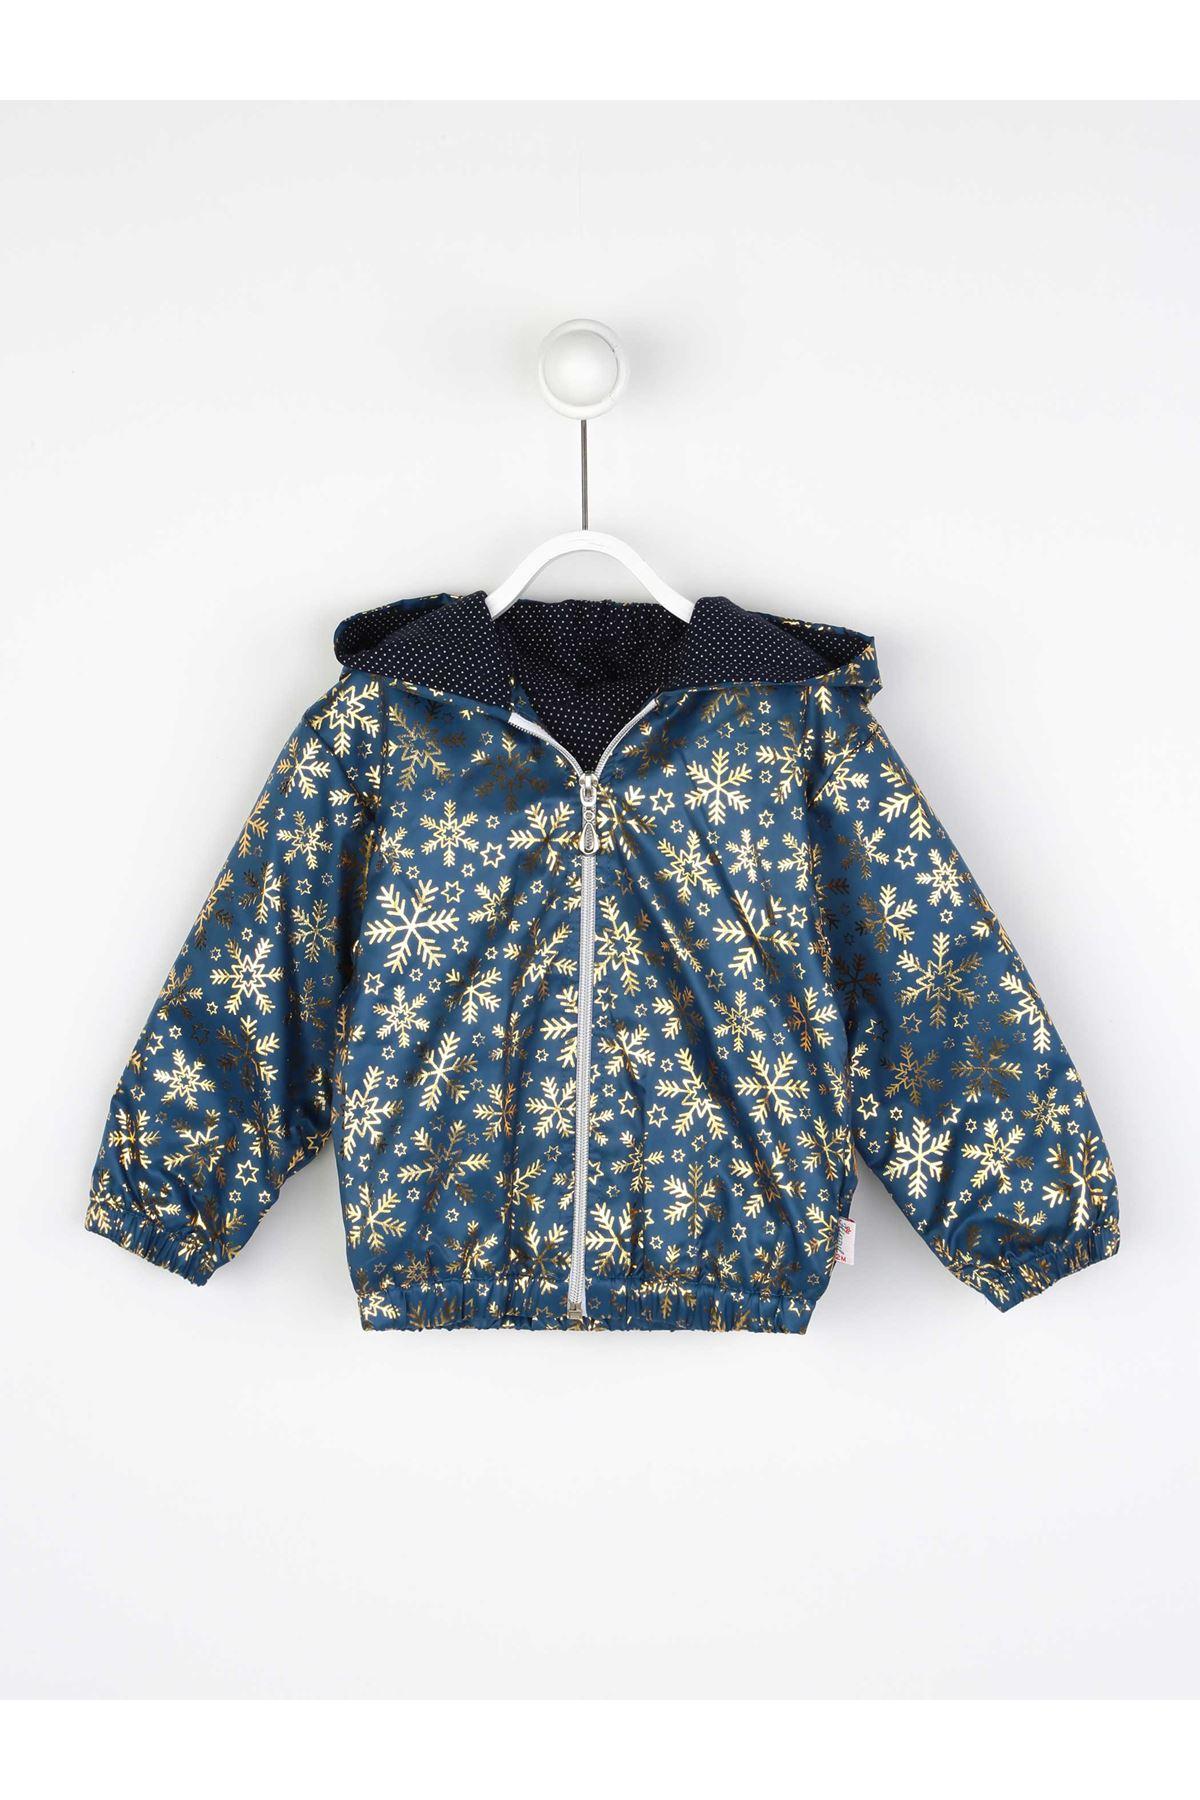 Navy blue Female Child Hooded Raincoat Thin Coats